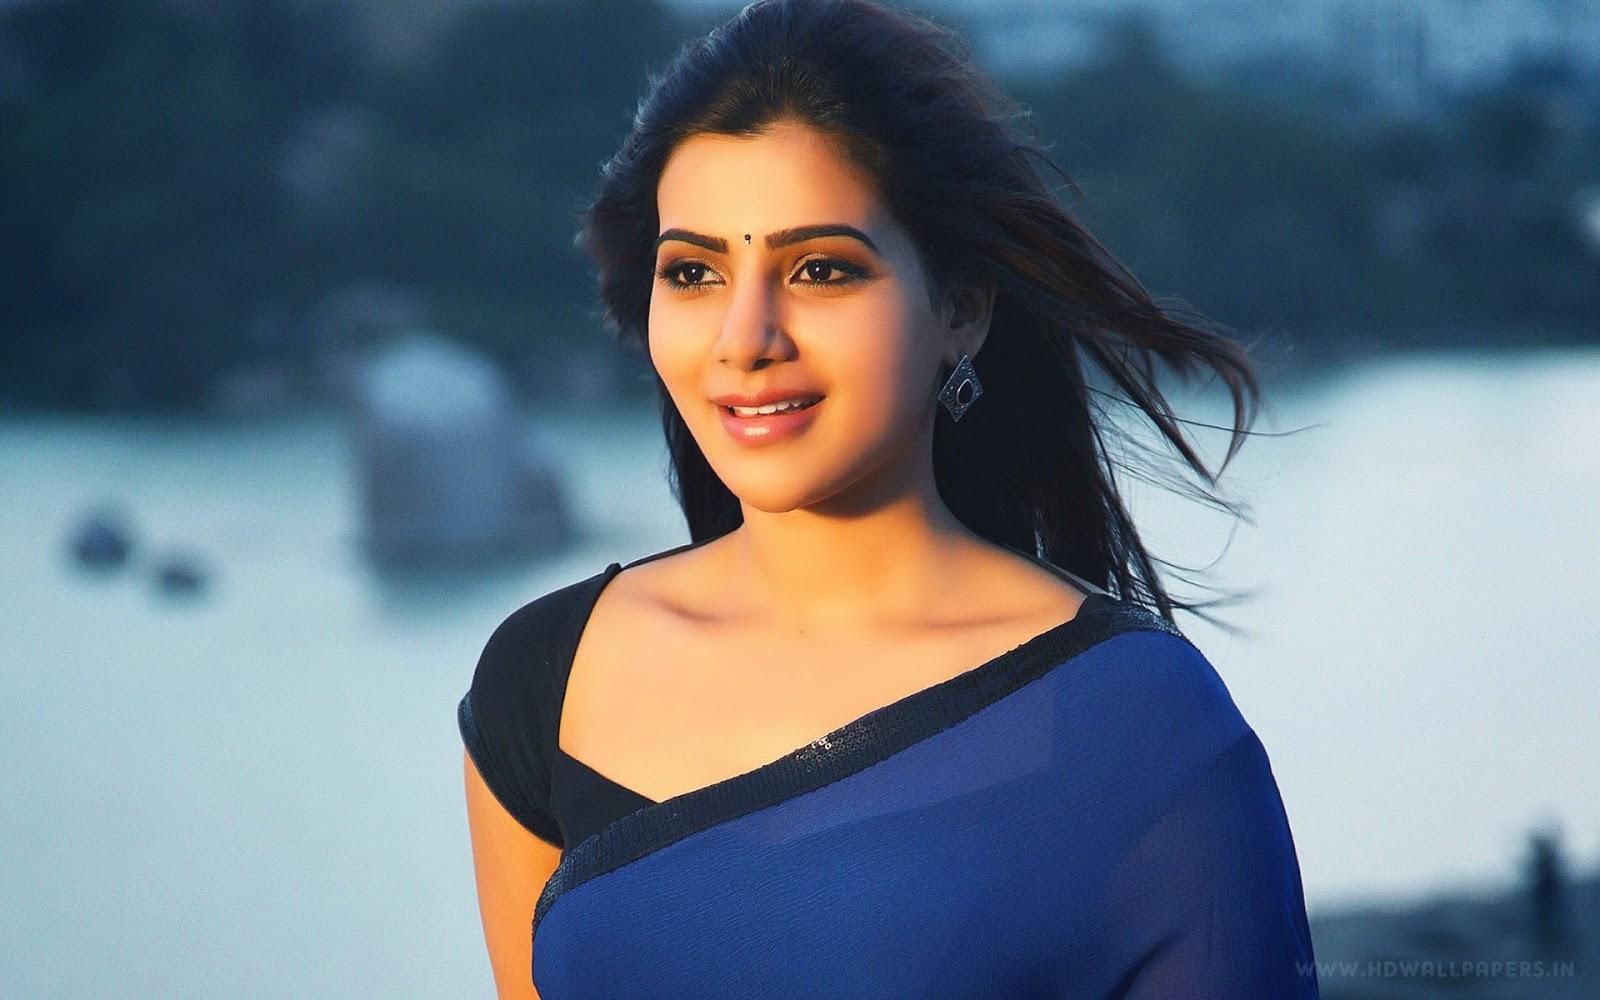 Actress Wallpapers Download Free: HD Wallpaper Download: Samantha 2014 Hot & Sexy Bollywood